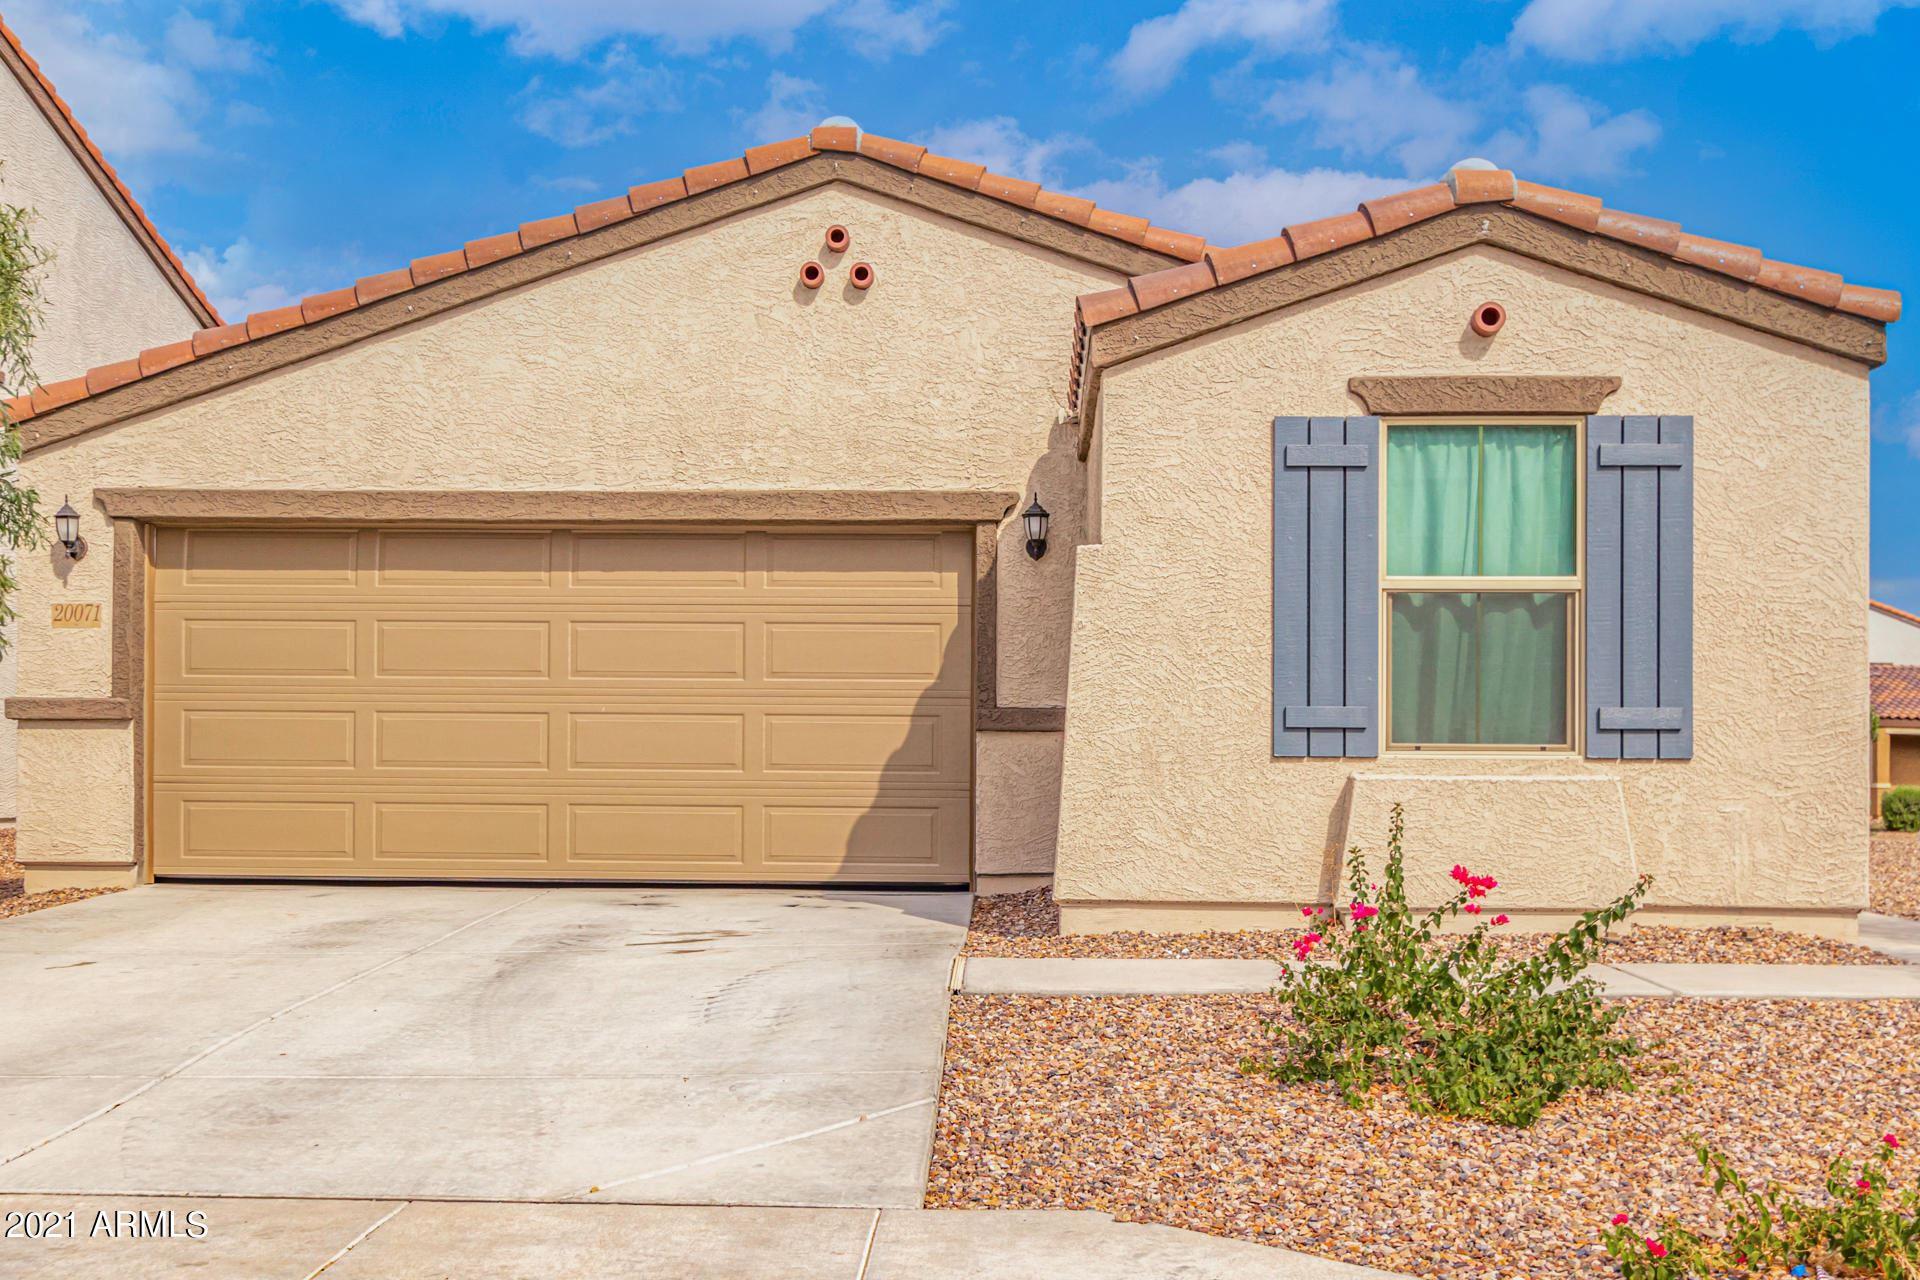 Photo of 20071 W Wilson Street, Buckeye, AZ 85326 (MLS # 6268528)